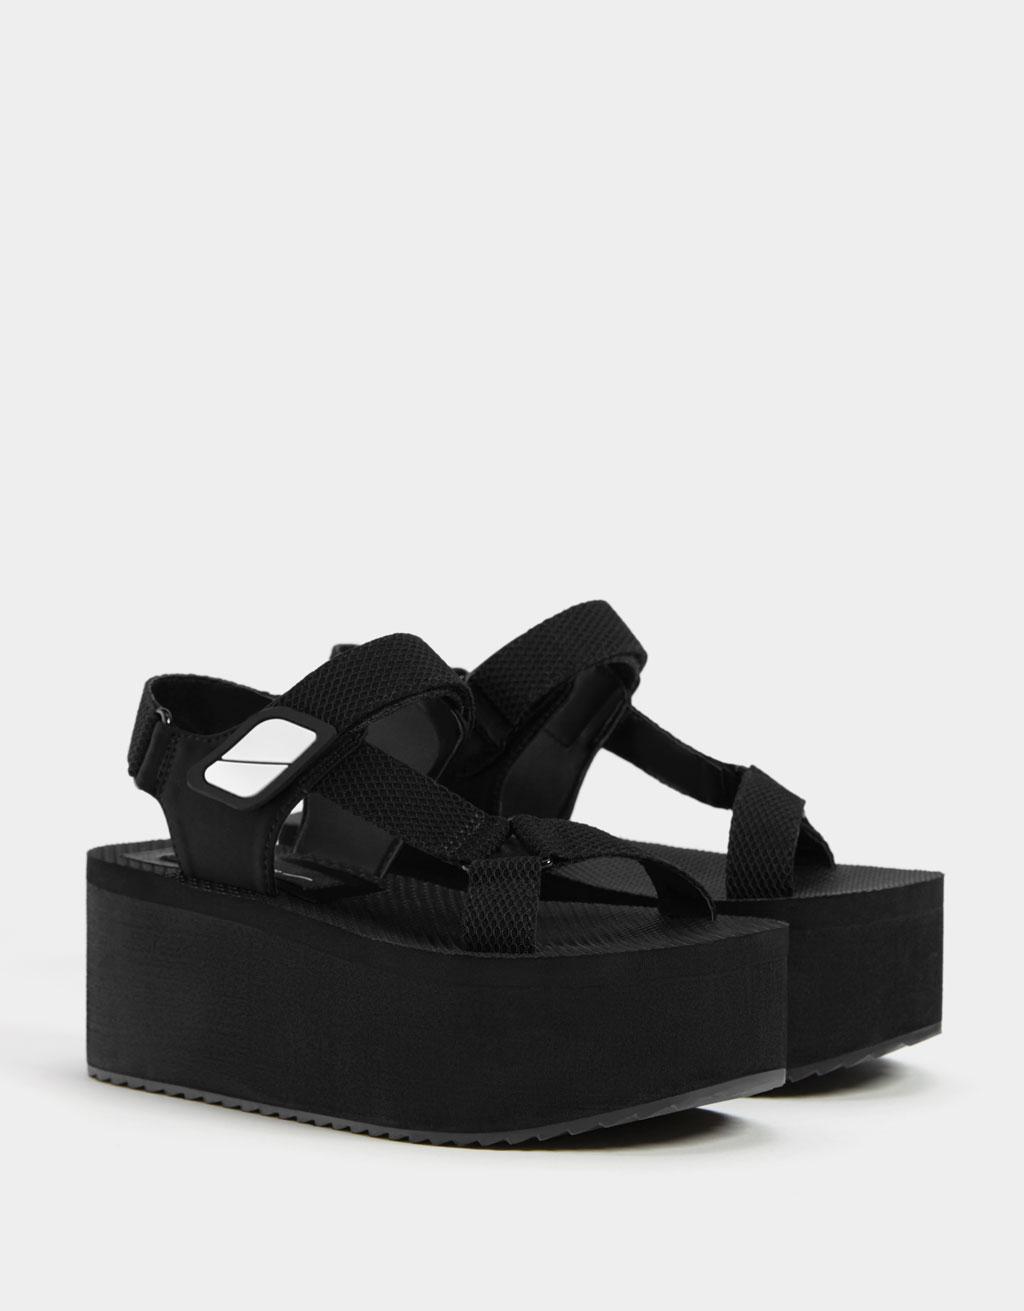 Sports platform sandals with straps